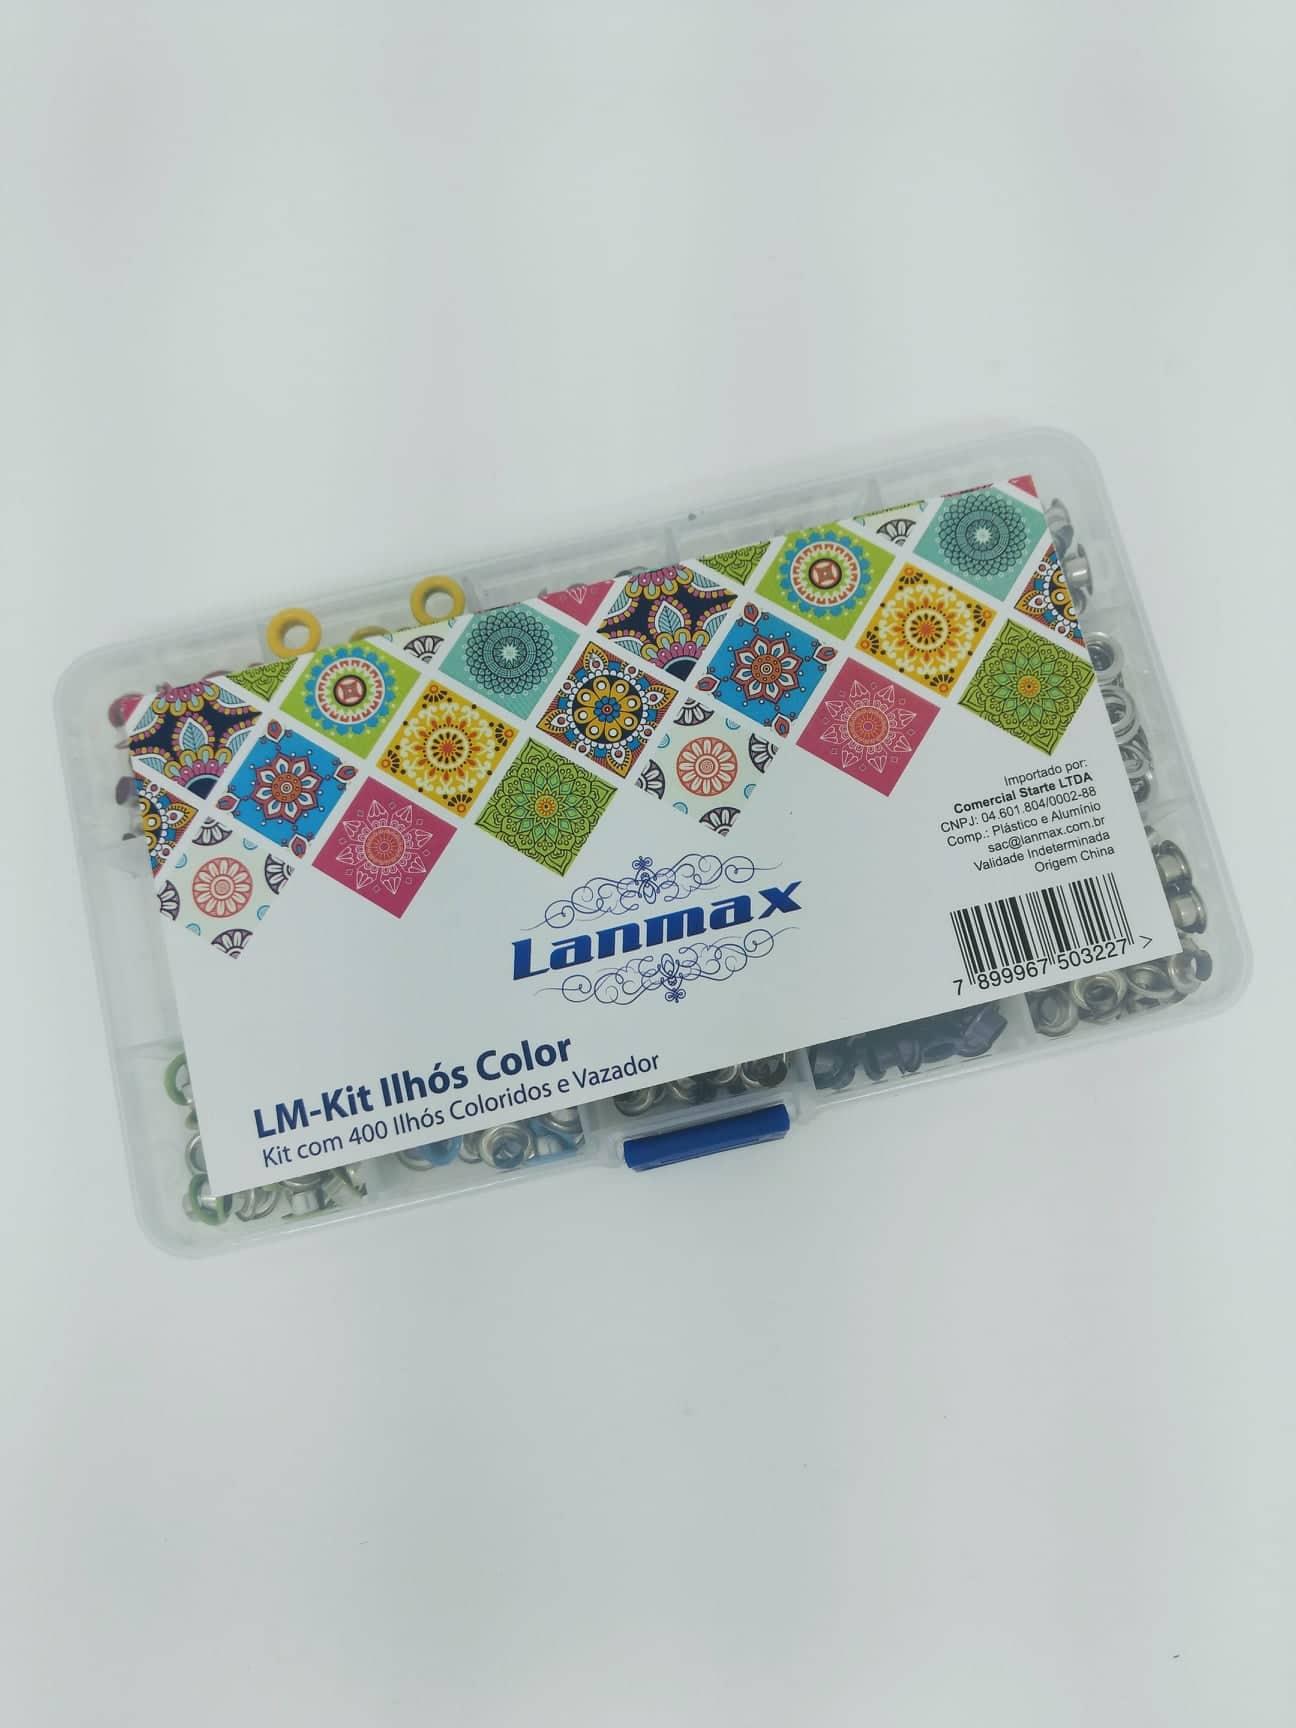 Kit com 400 ilhós coloridos e vazador - Lanmax